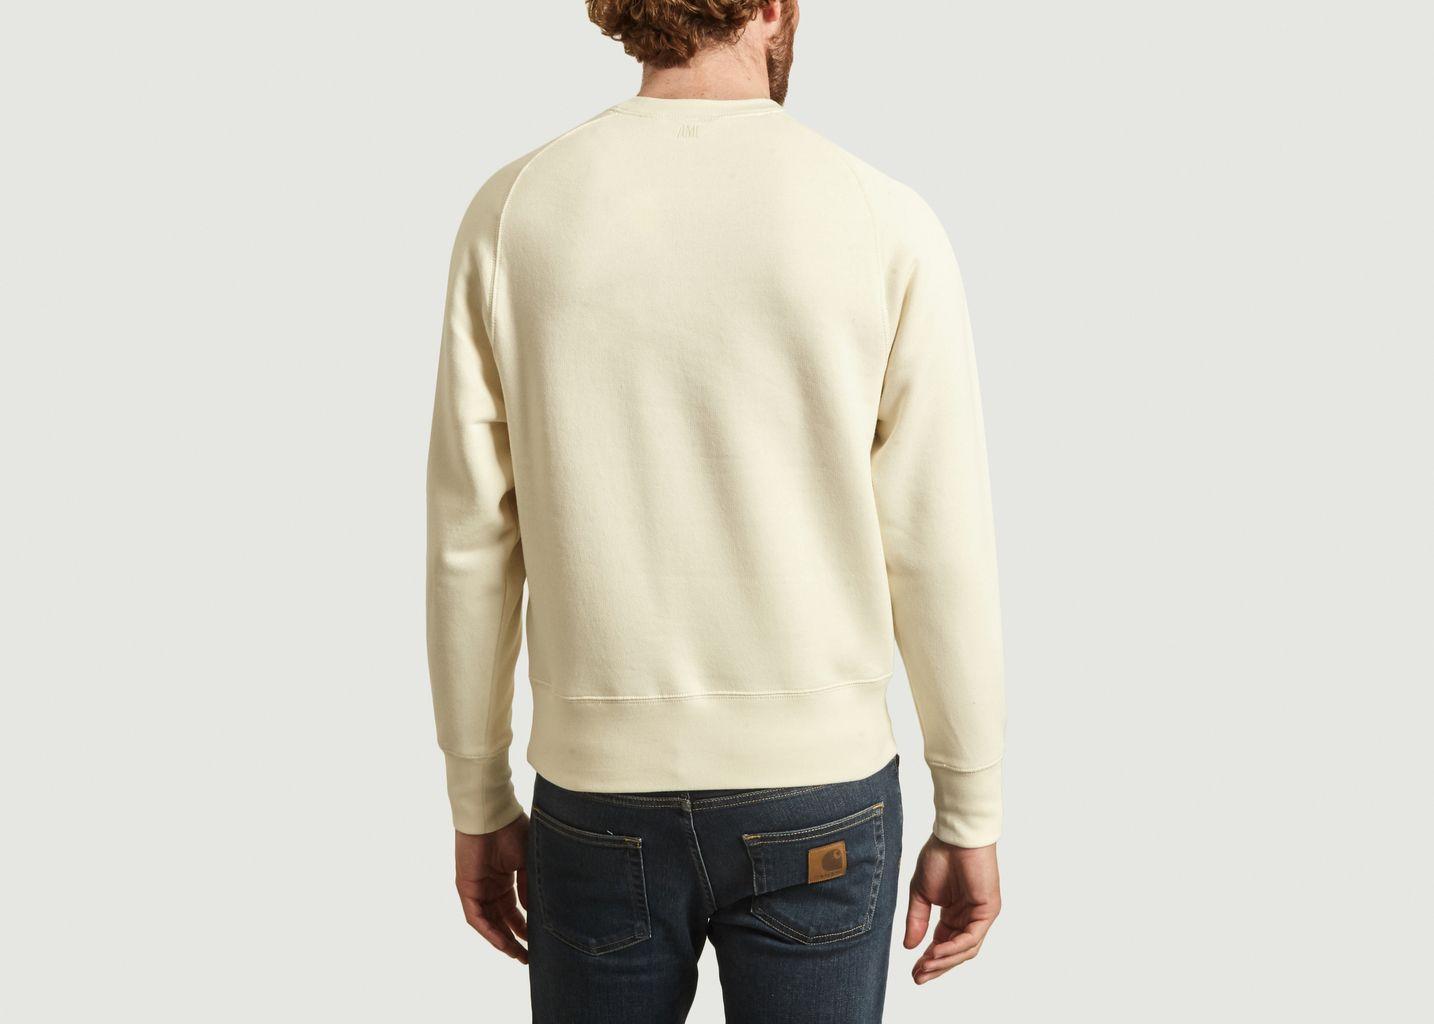 Sweatshirt Ami de Coeur point chaînette - AMI Alexandre Mattiussi